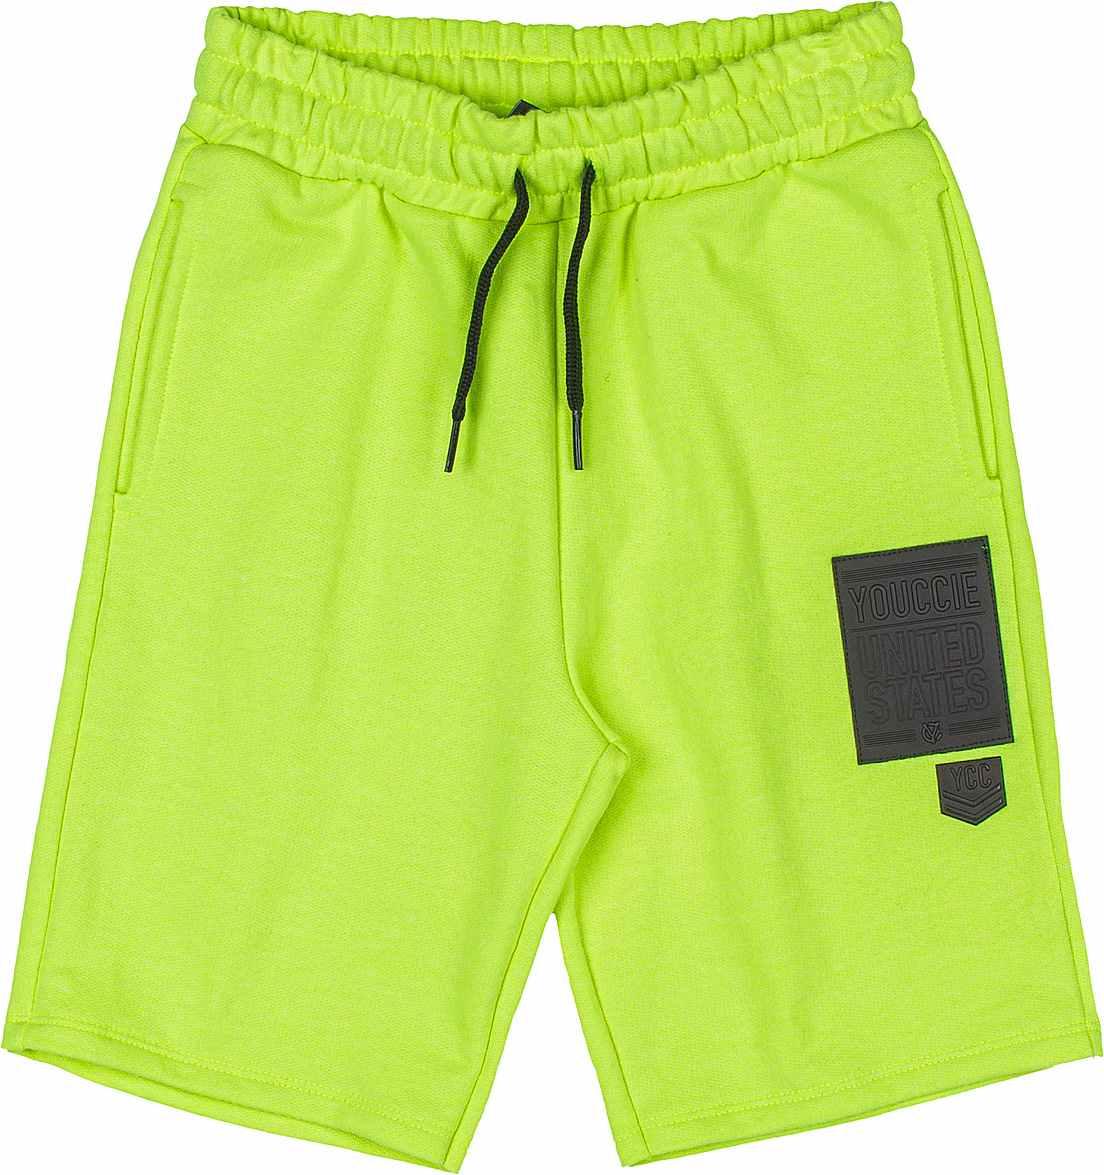 Bermuda Infantil Moletom Verde Neon Youccie